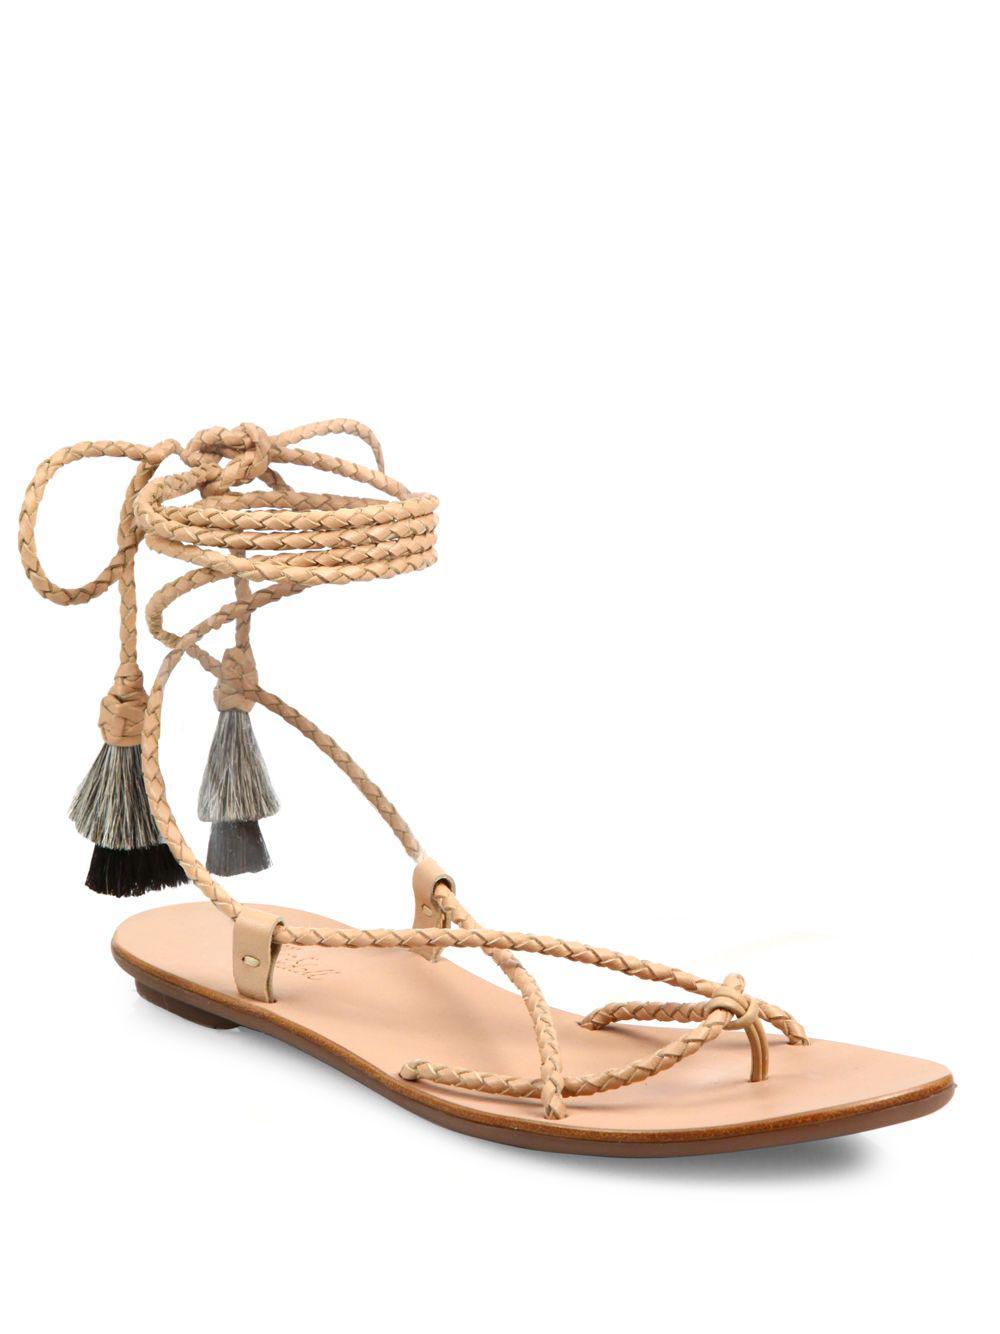 Loeffler Randall Leather Ankle Strap Sandals clearance fashion Style geniue stockist cheap online nicekicks online DISDgFXSB